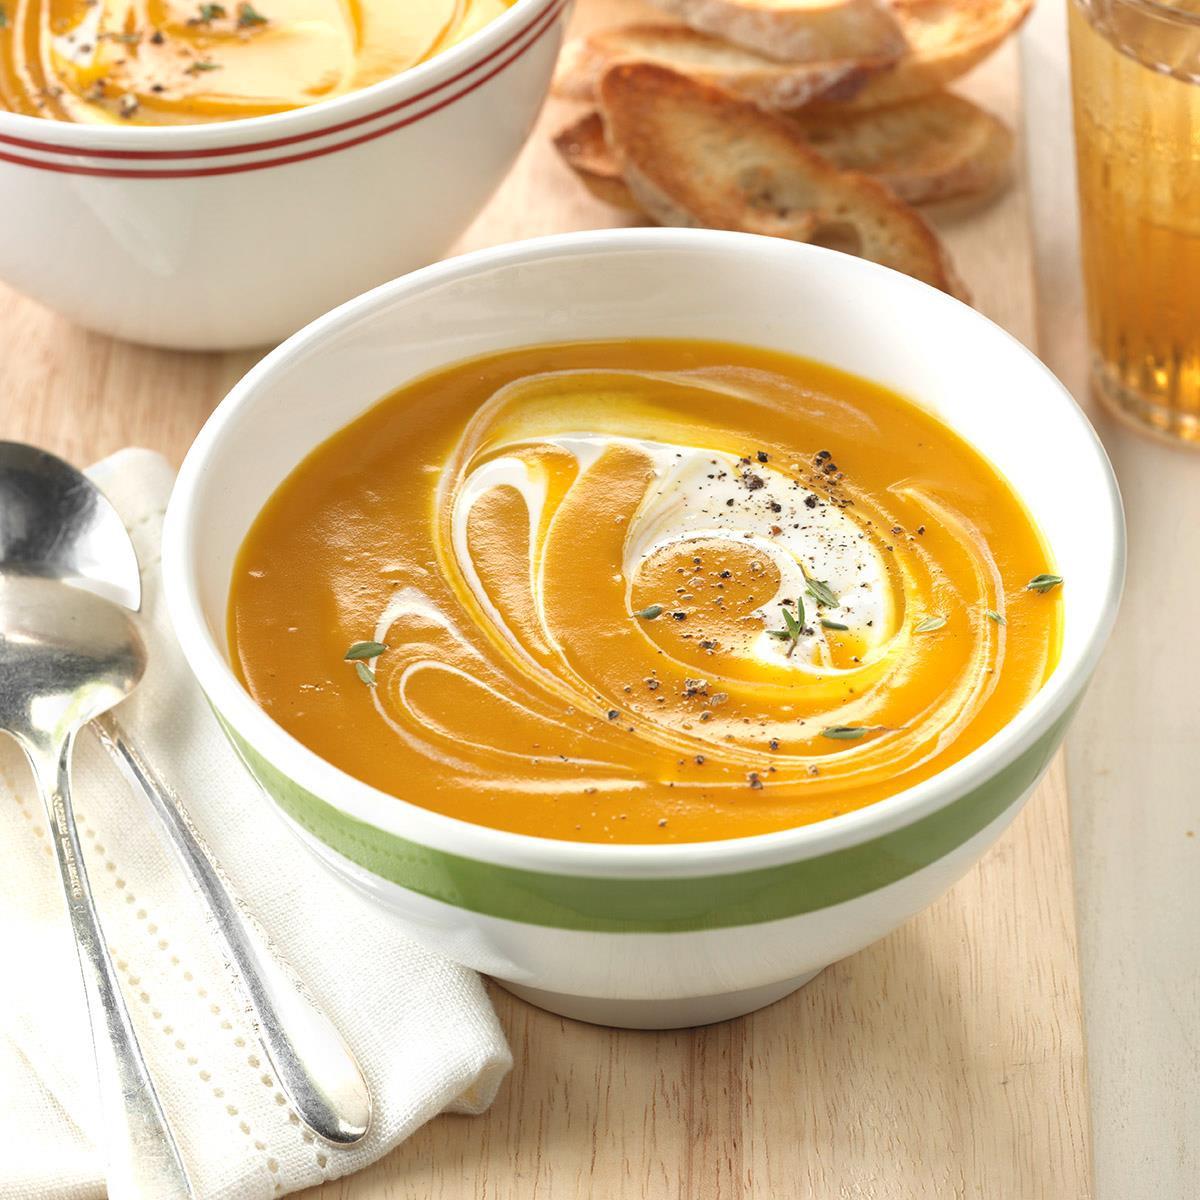 Slow Cooker Butternut Squash Soup  Slow Cooker Butternut Squash Soup Recipe